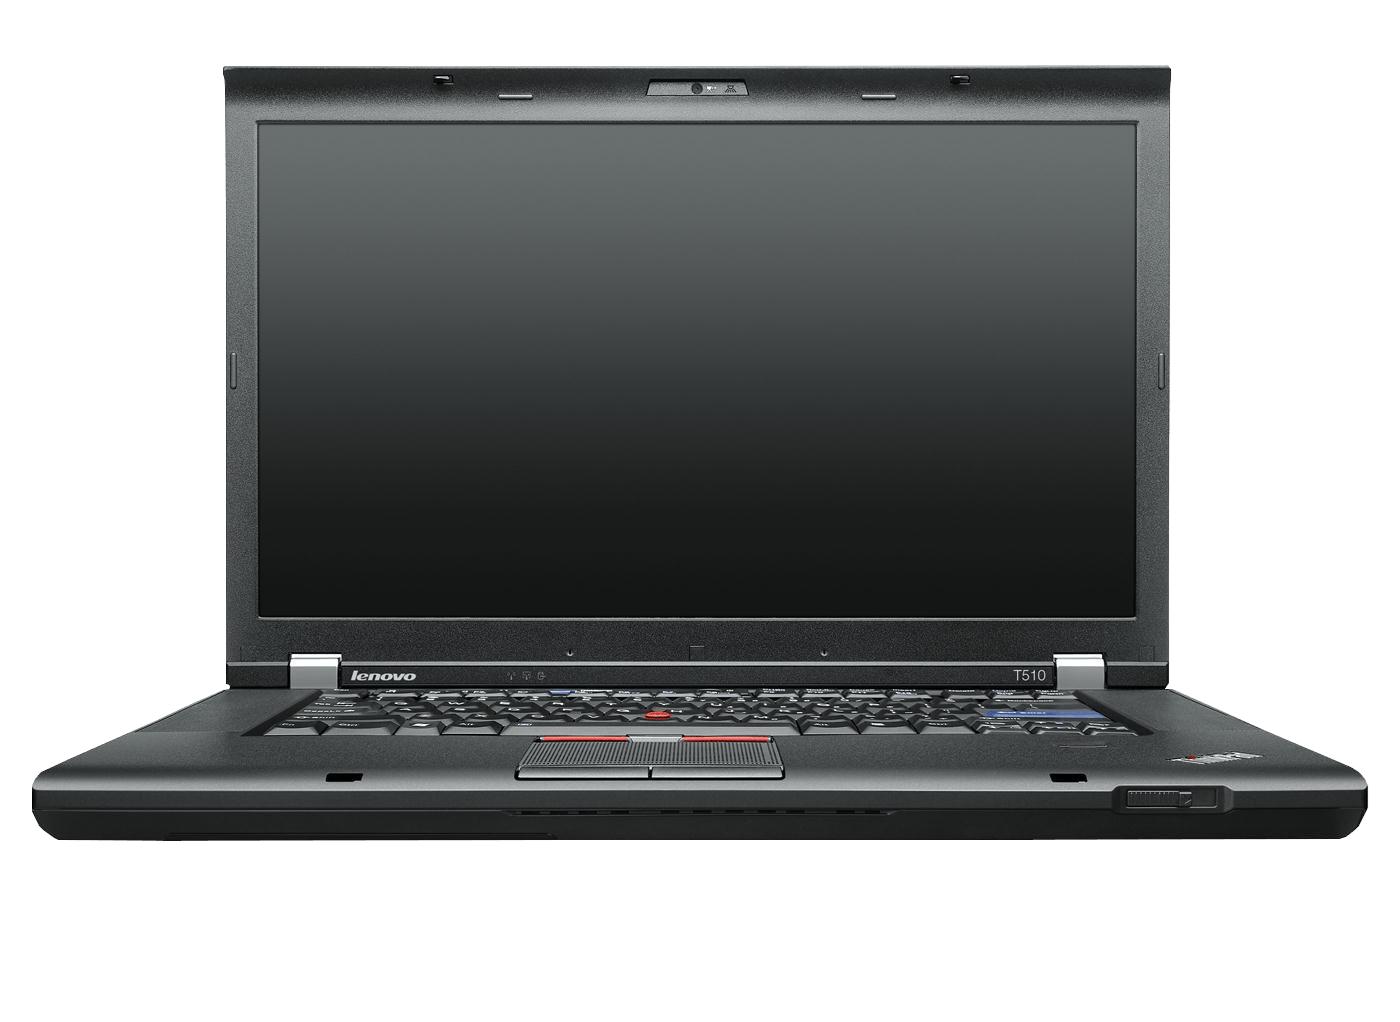 lenovo Lenovo thinkpad t510 på refurb